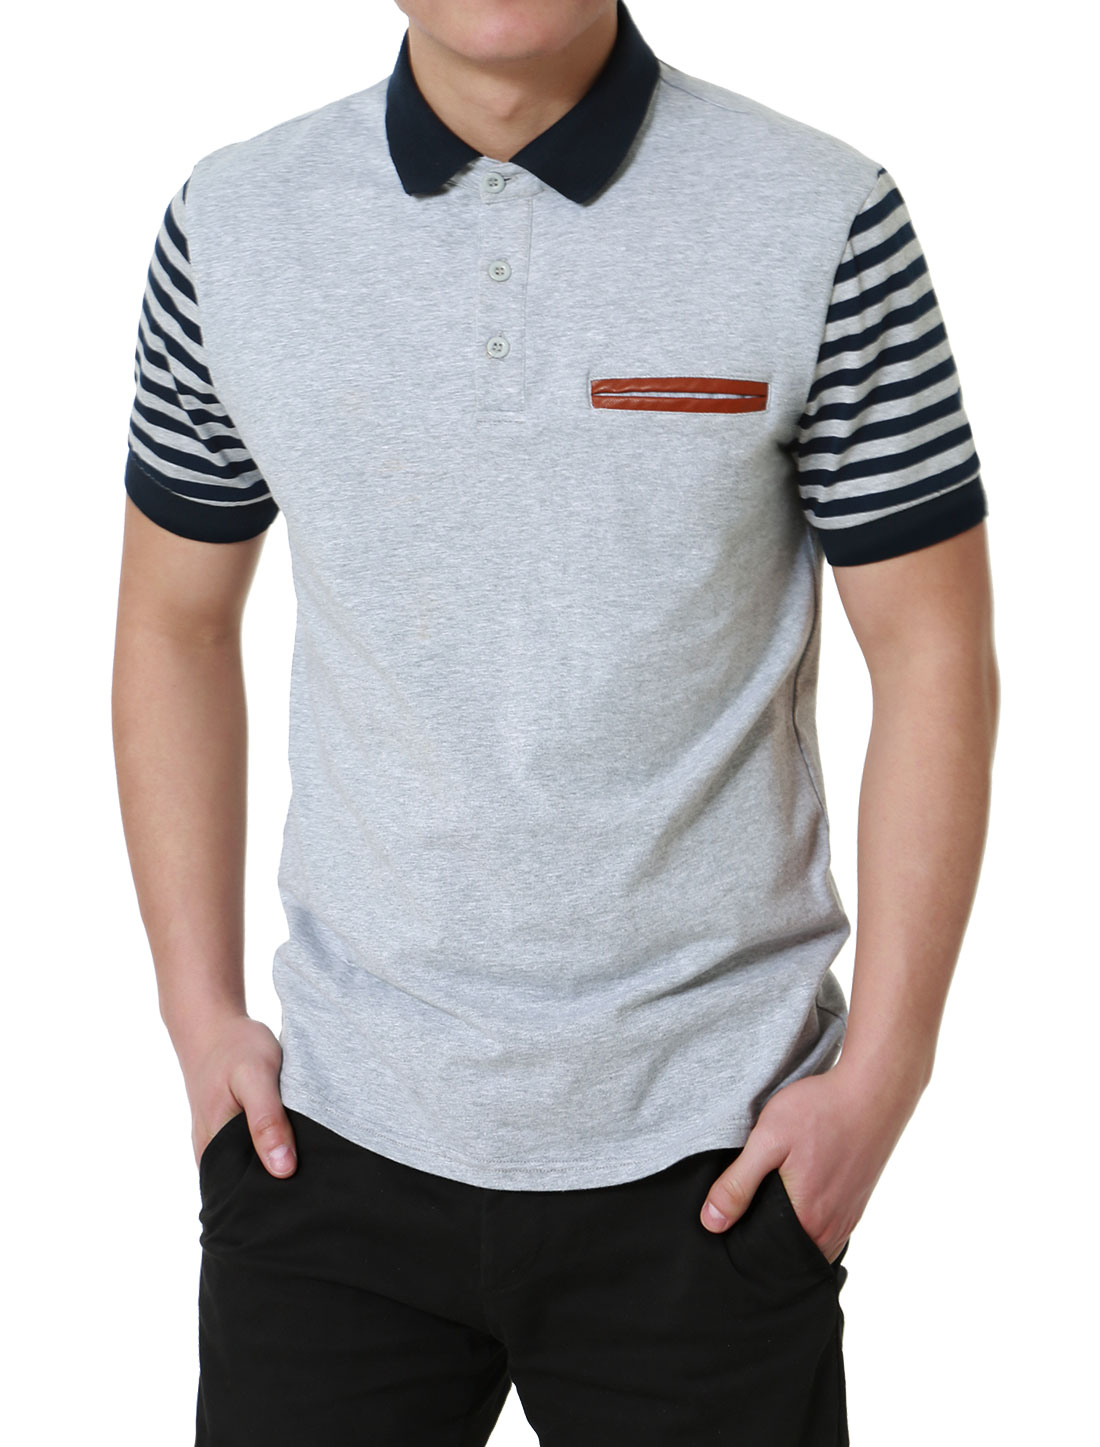 Men Regular Fit Pocket Stripe Short Sleeve Cotton Golf Polo Shirt Heather Gray S